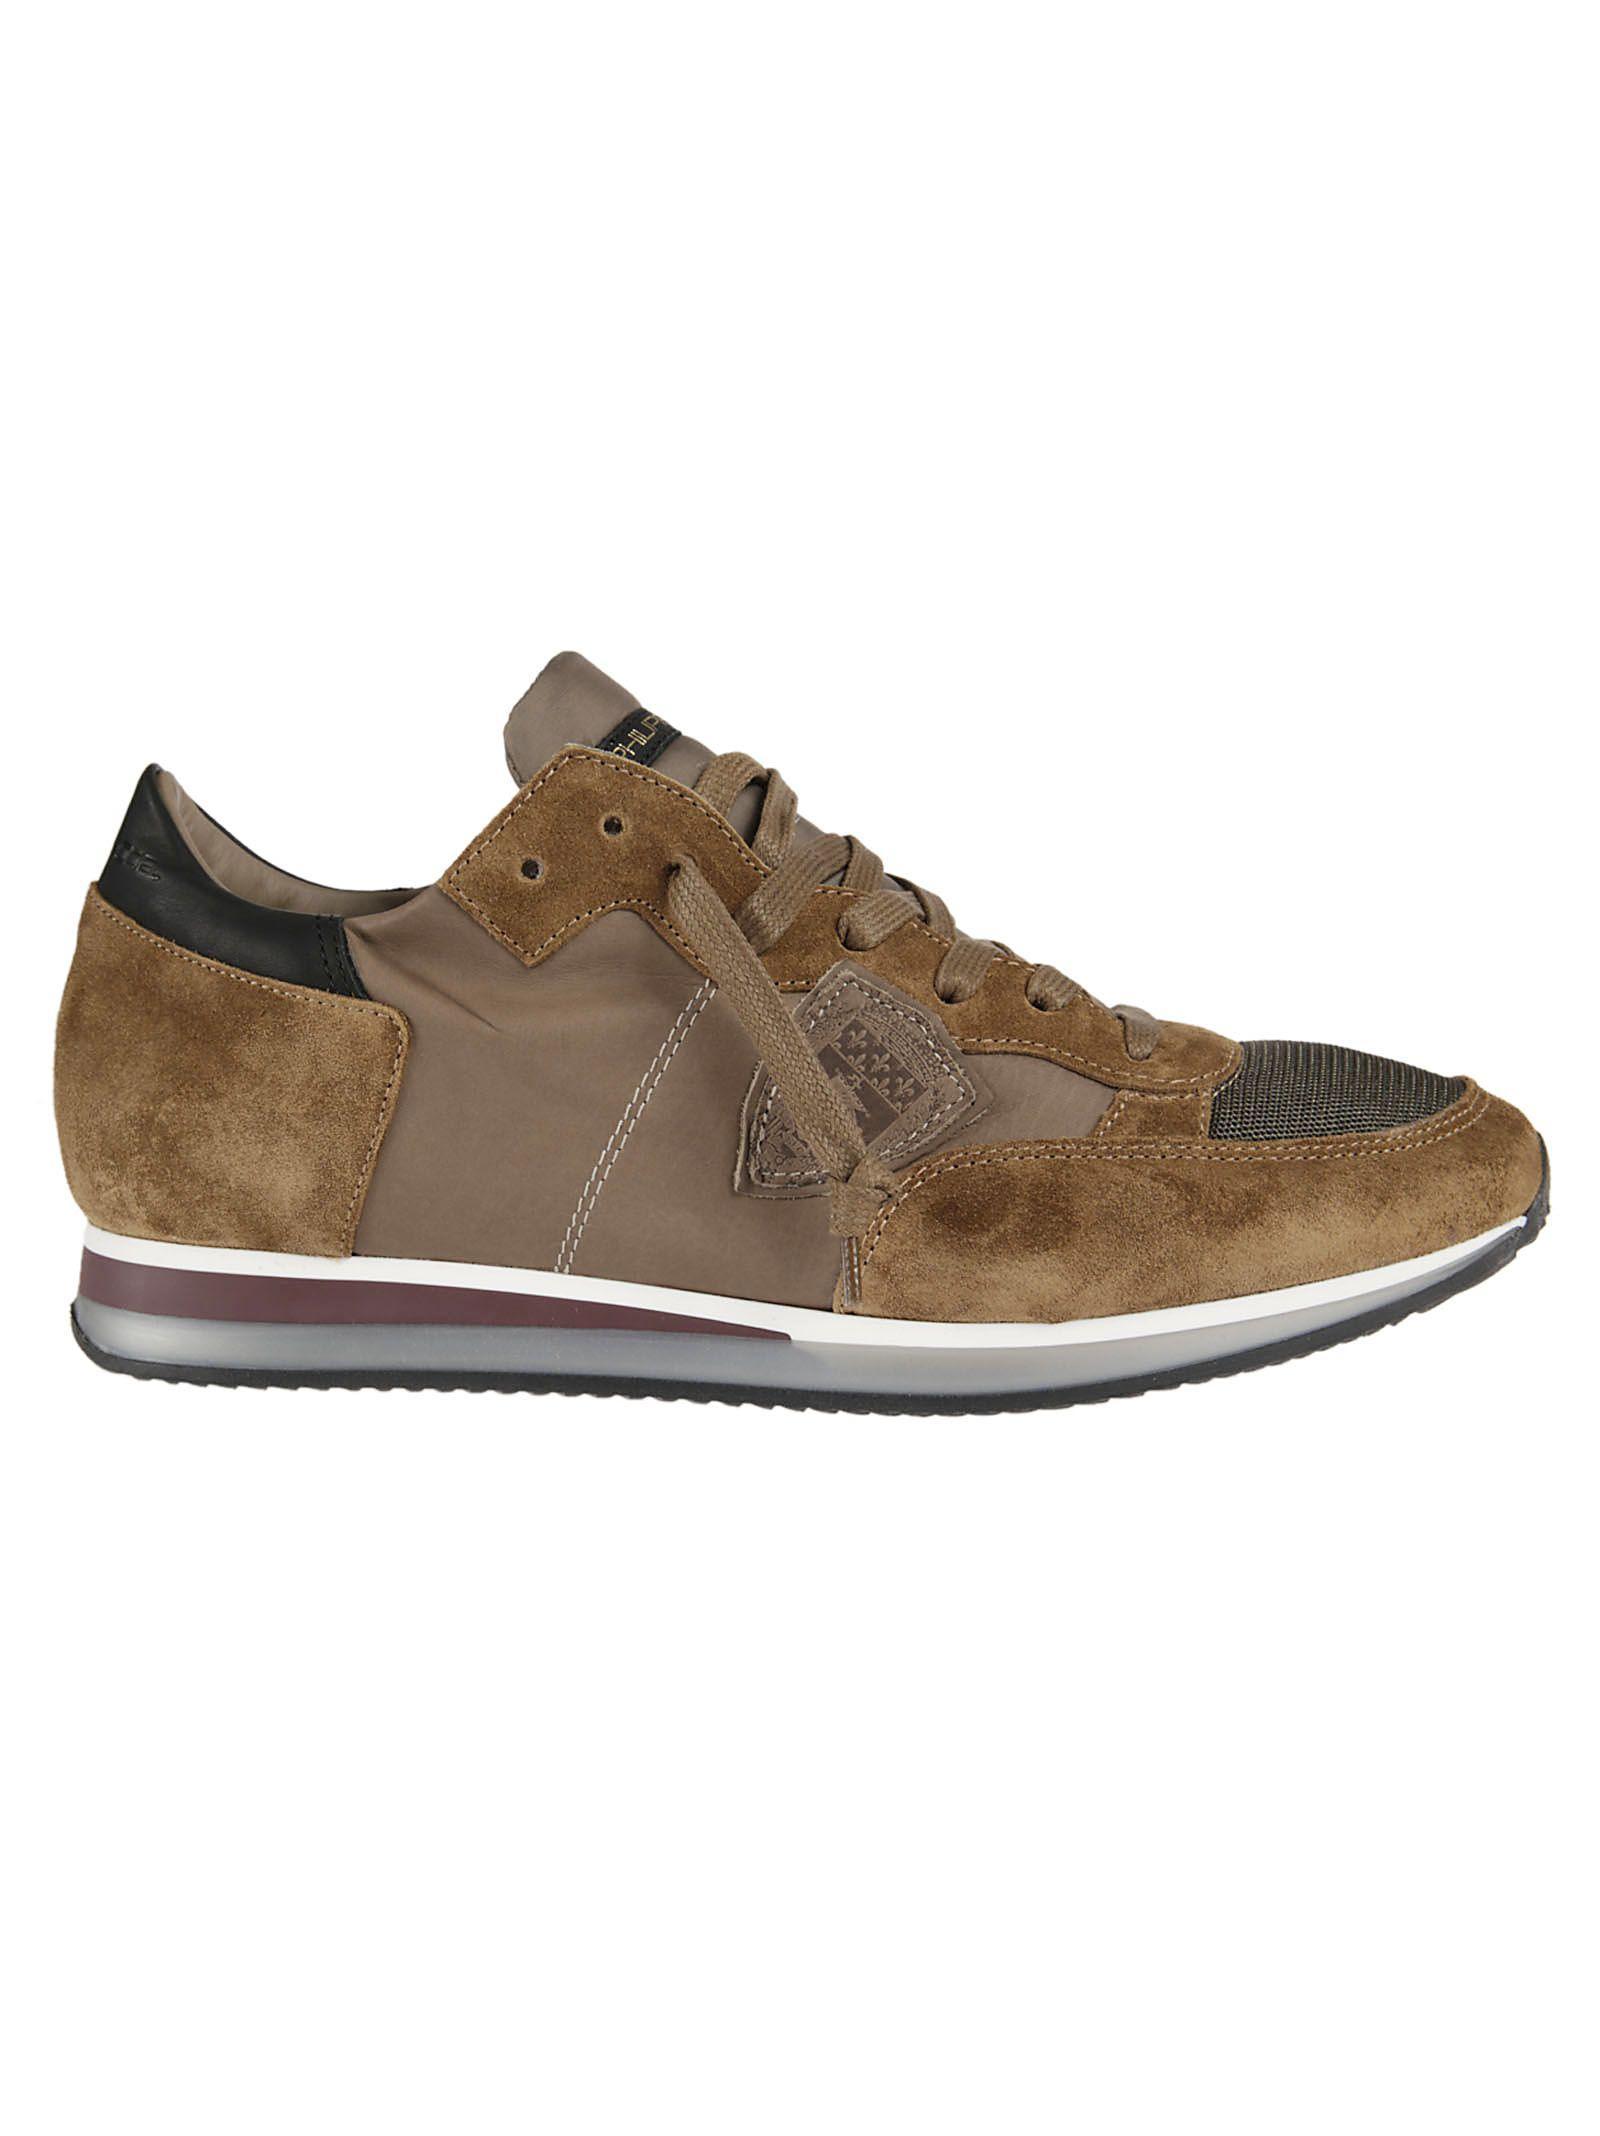 Philippe Model Tropez Sneakers In Brown